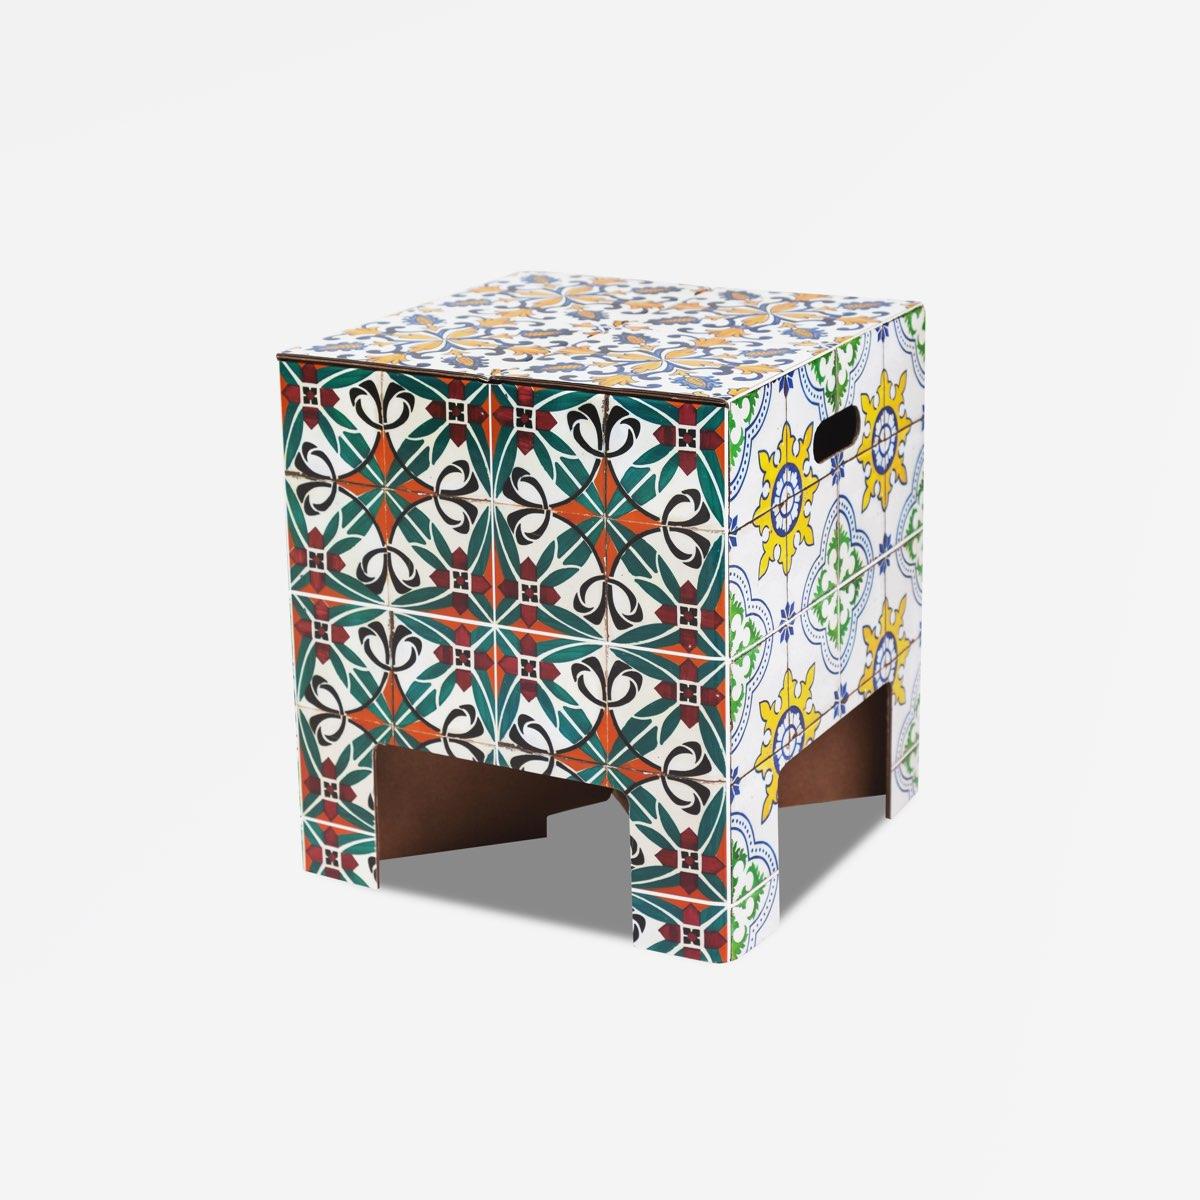 Dutch Design Chair woodstack Dutch Design Chair Tiles